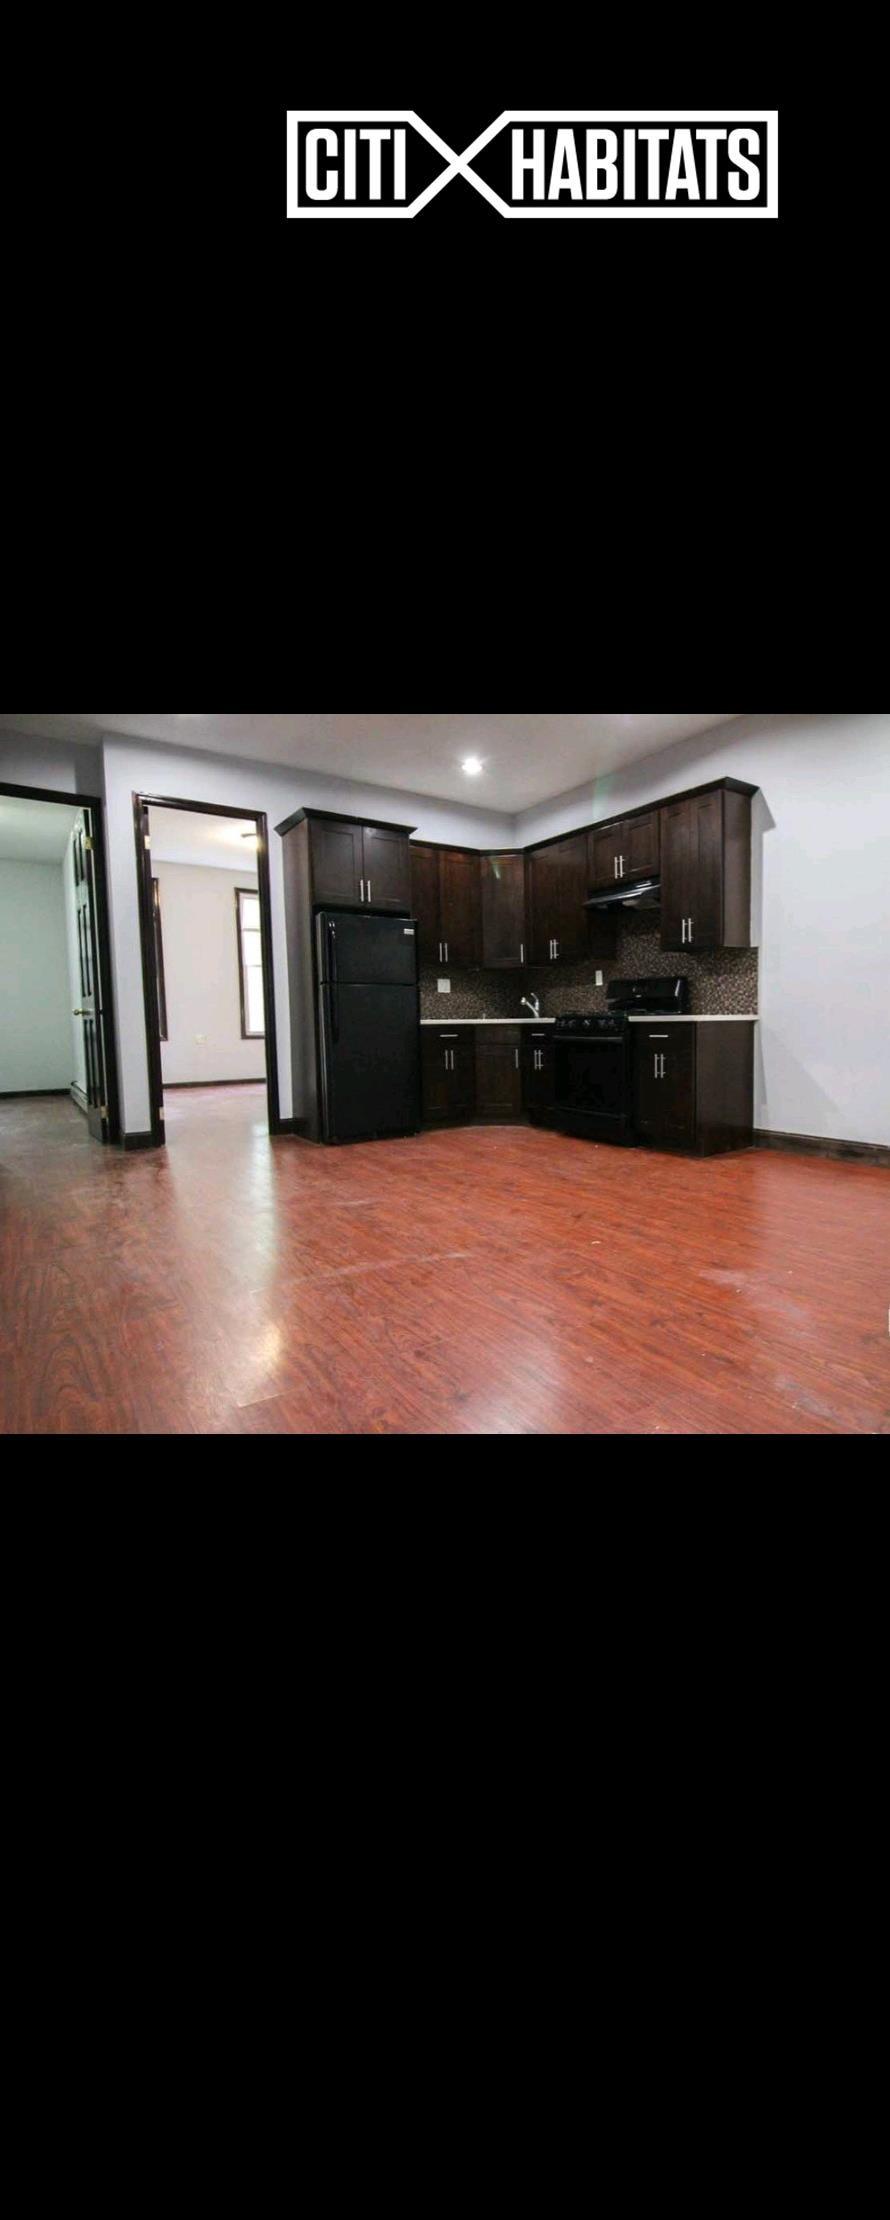 hardwood flooring federal way of william gonzalez citihabitats com in 96822388